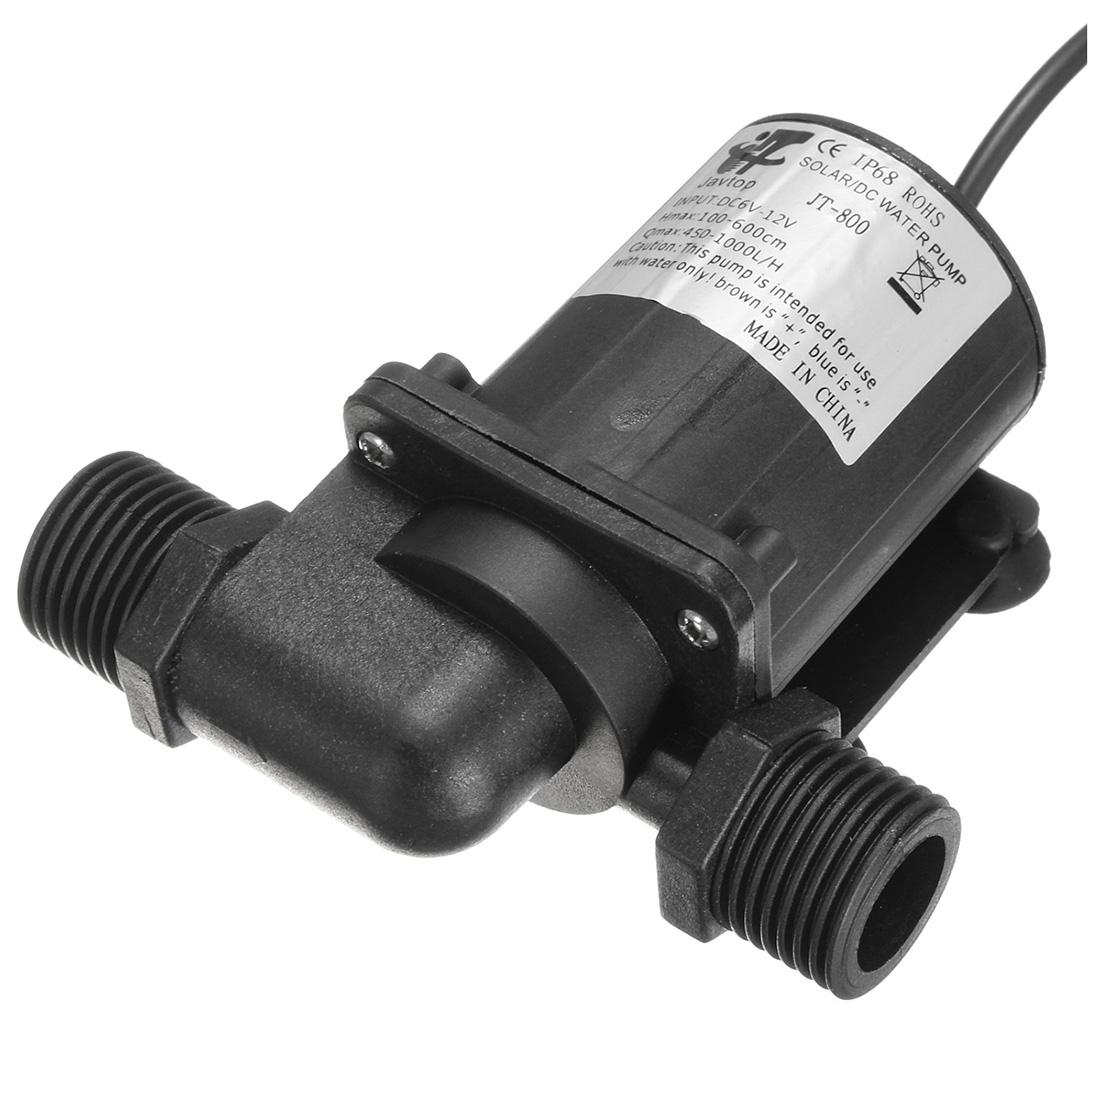 Dc 12v Electric Solar Brushless Motor Water Pump